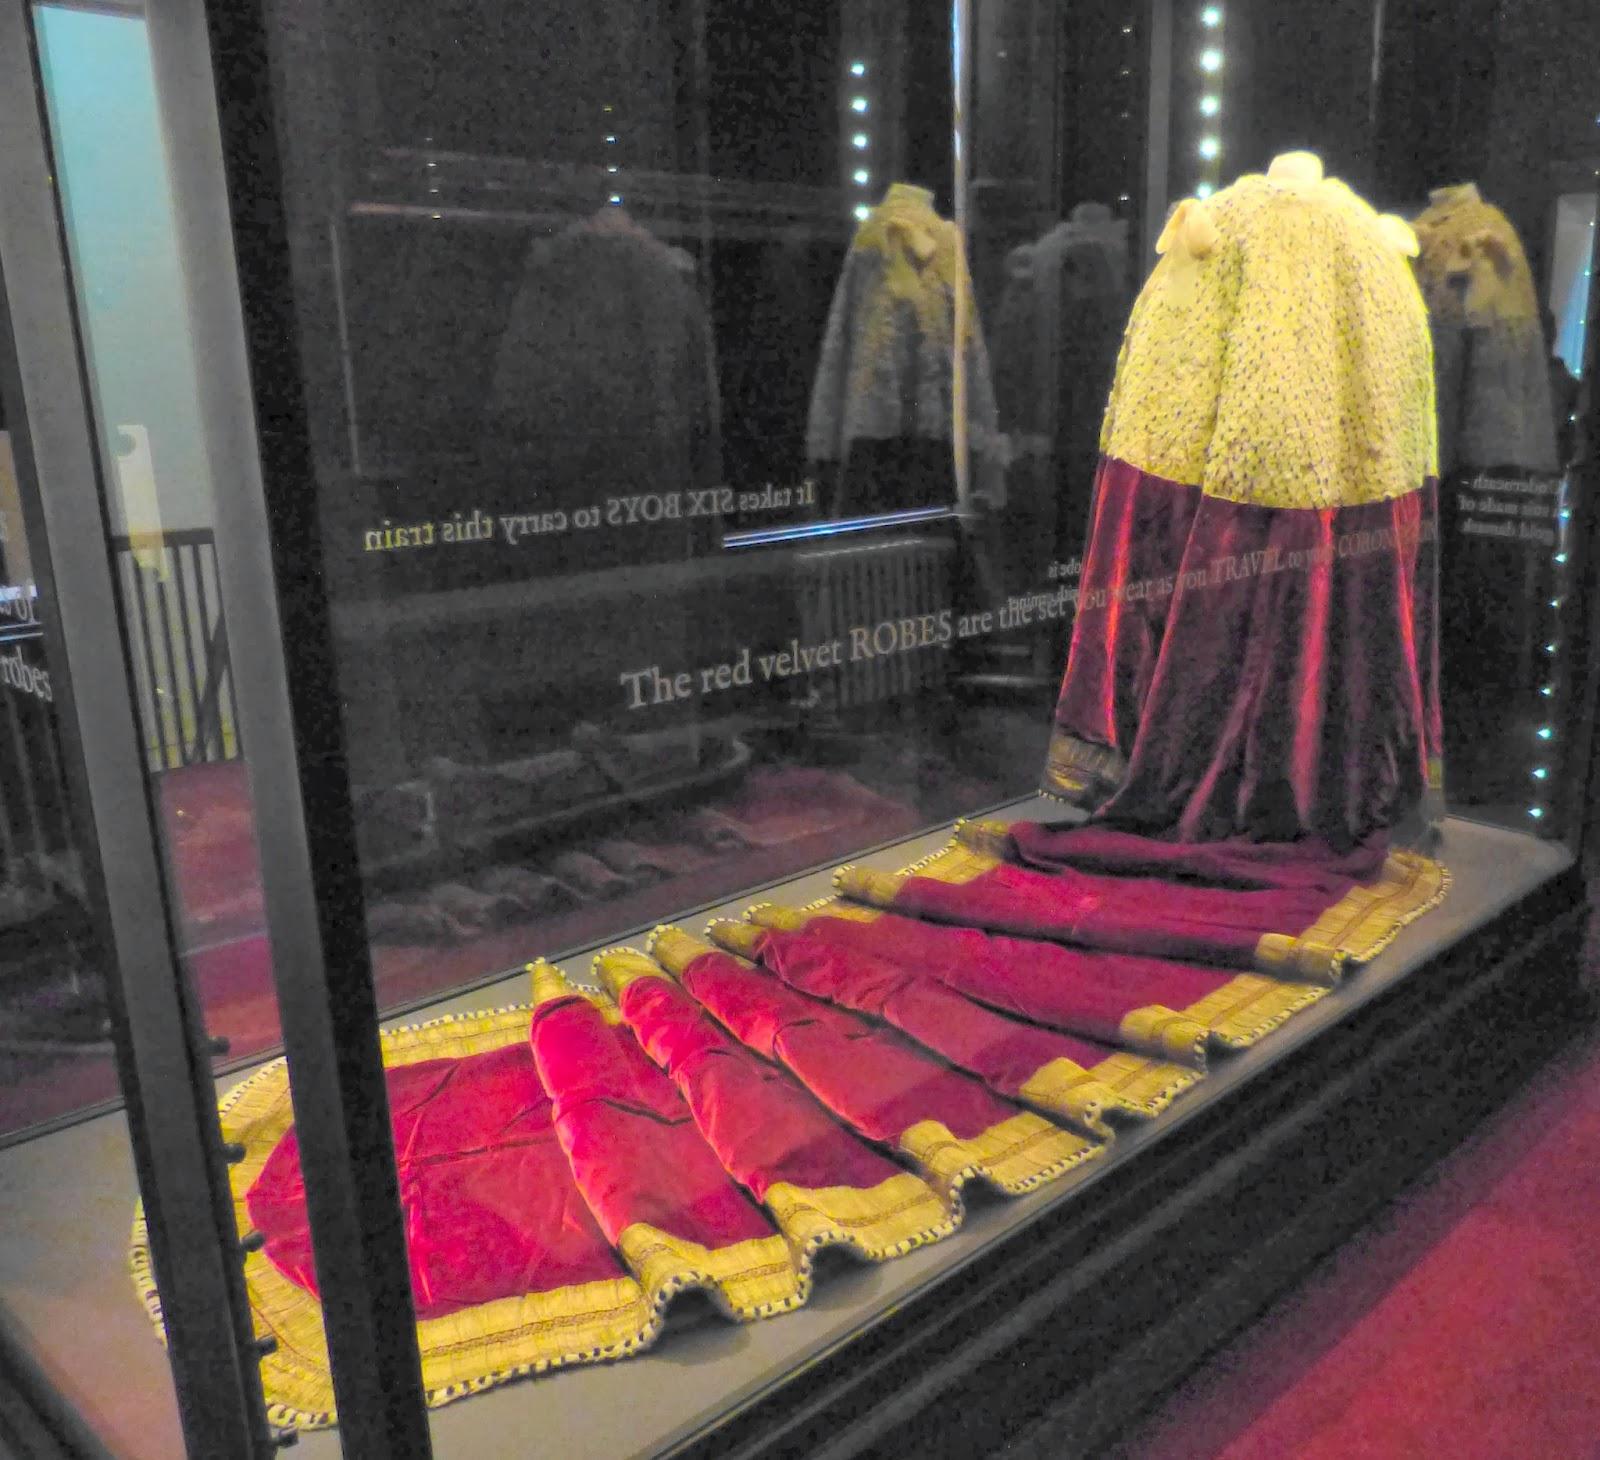 George III's coronation robes on display in Kensington Palace